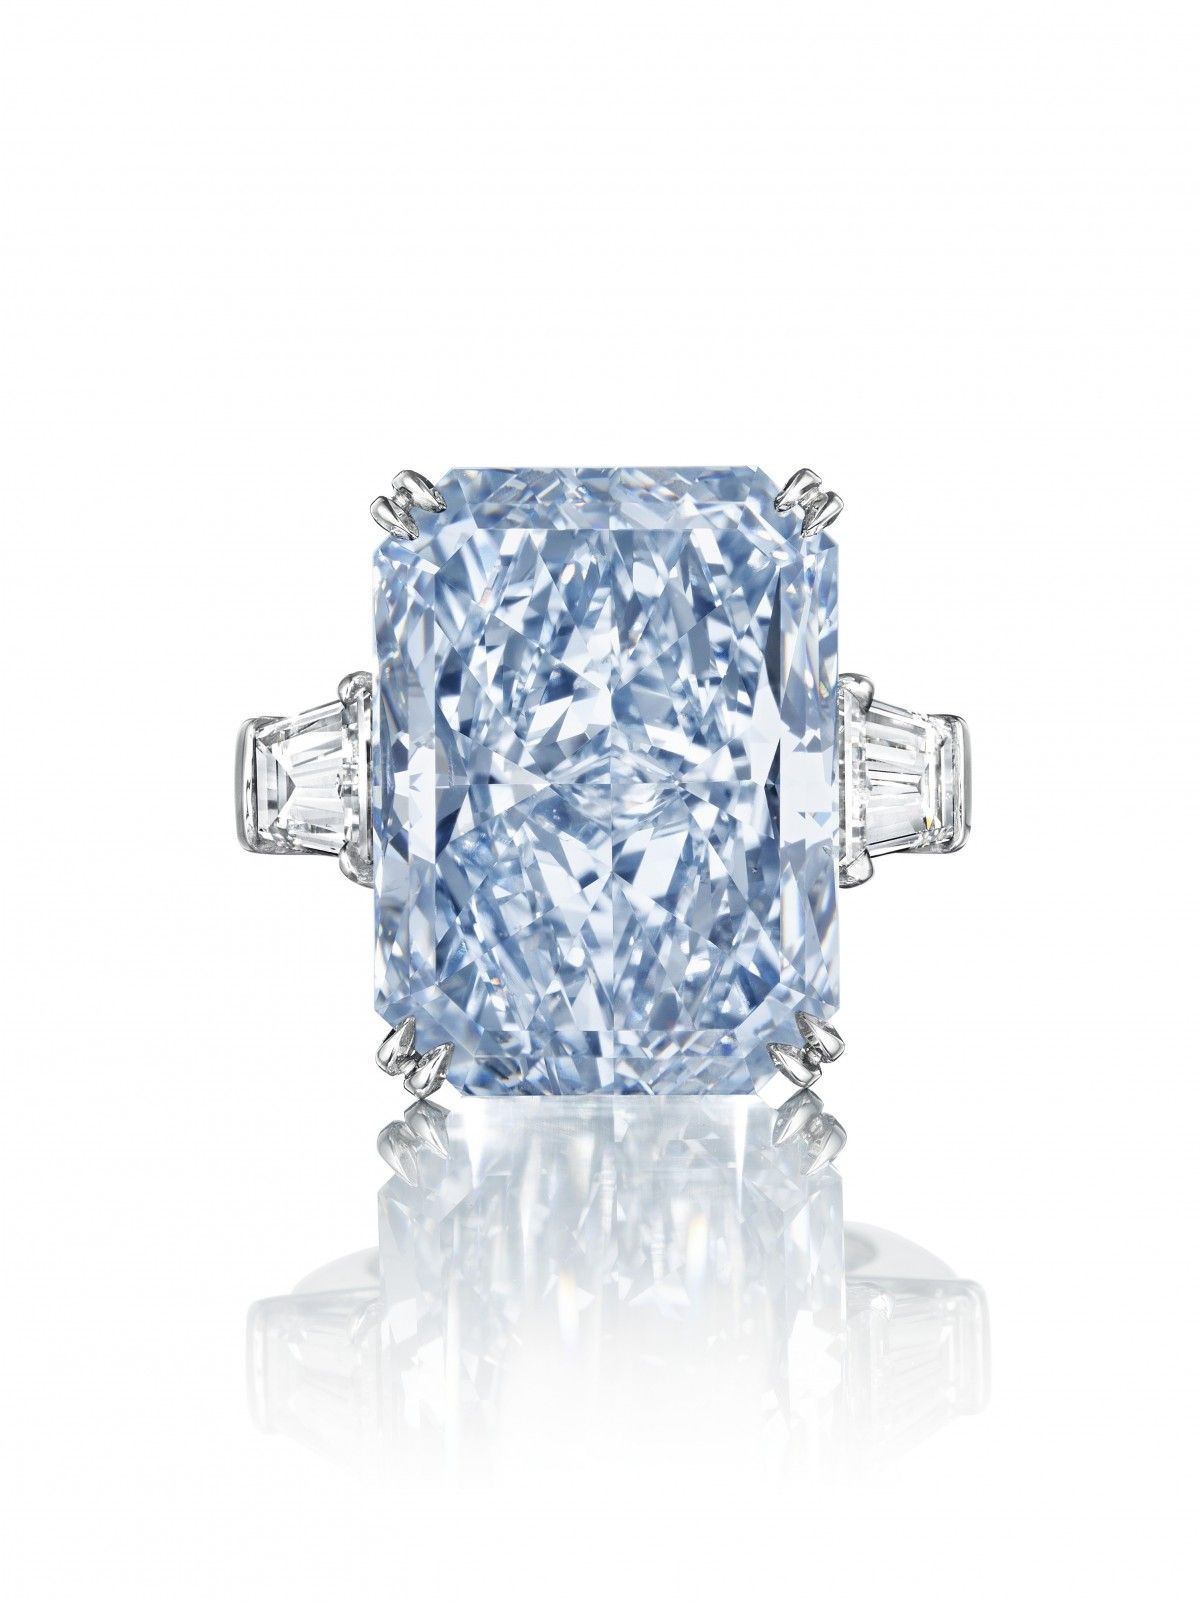 24-Carat 'Cullinan Dream' Blue Diamond Sells For a Record Breaking $25.3 Million